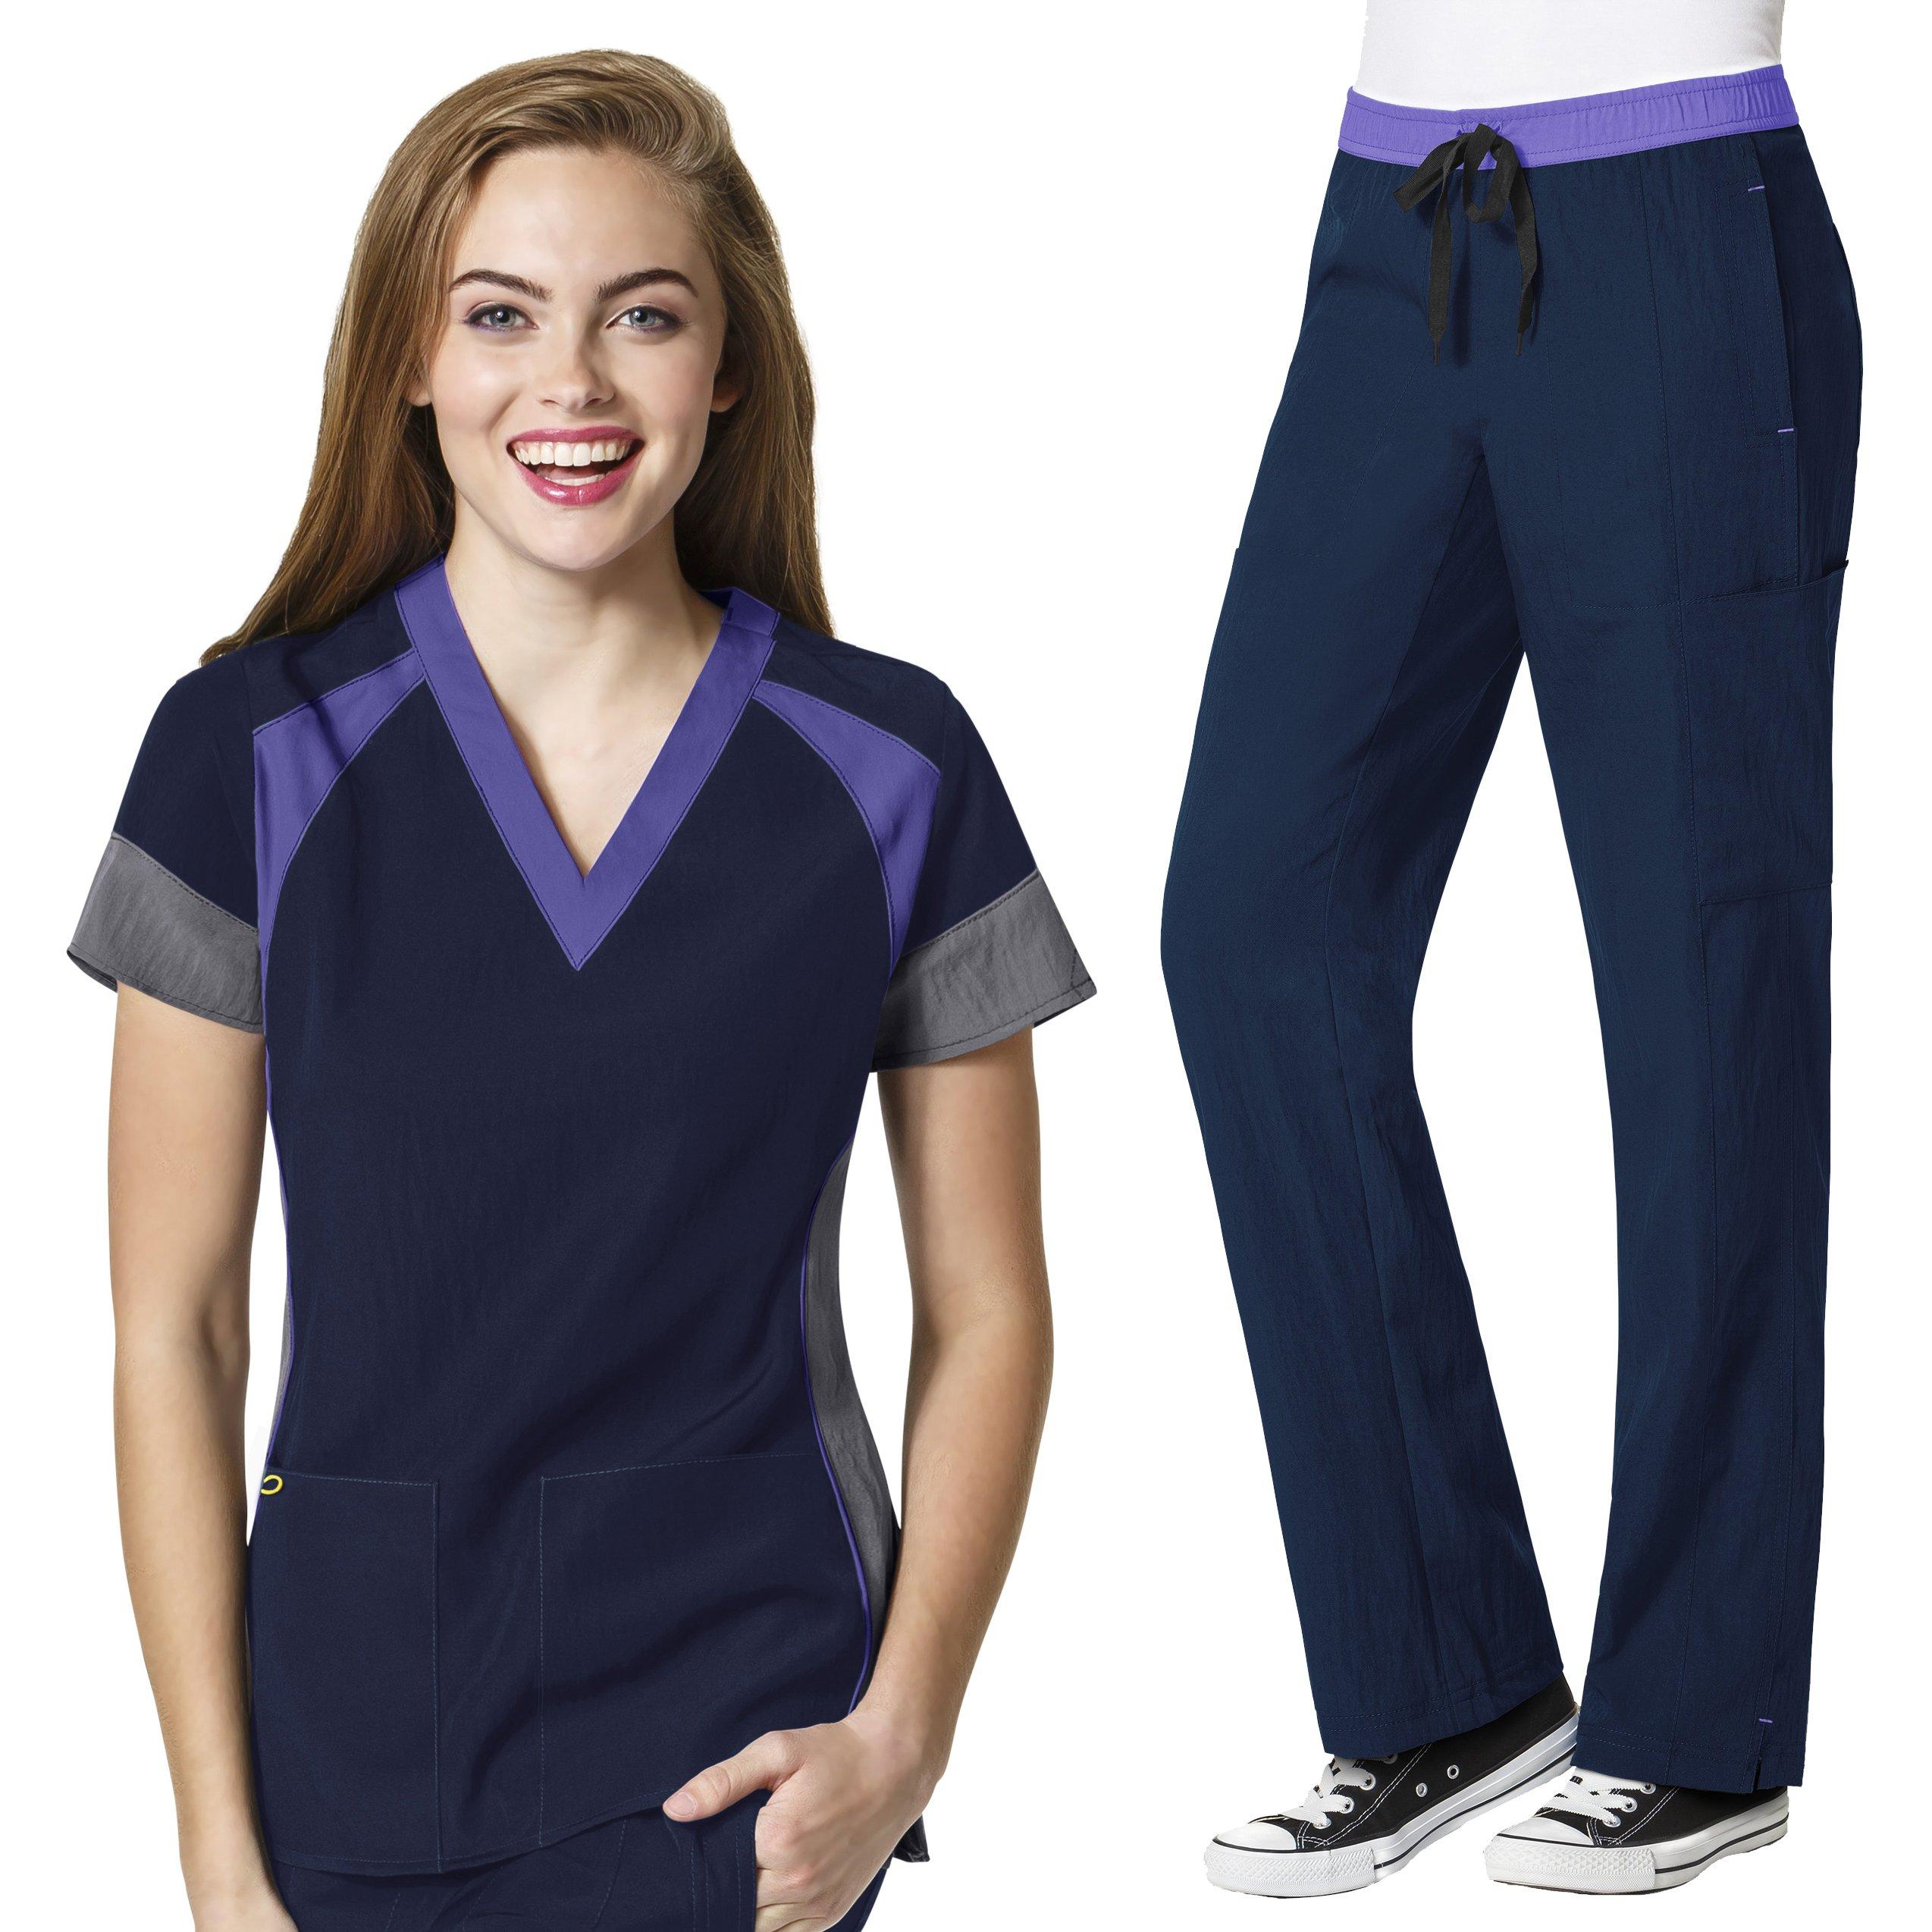 Four-Stretch Women's Color Block V-neck Top & Straight Leg Cargo Pant Scrub Set+ FREE GIFT [XS - 3XL]